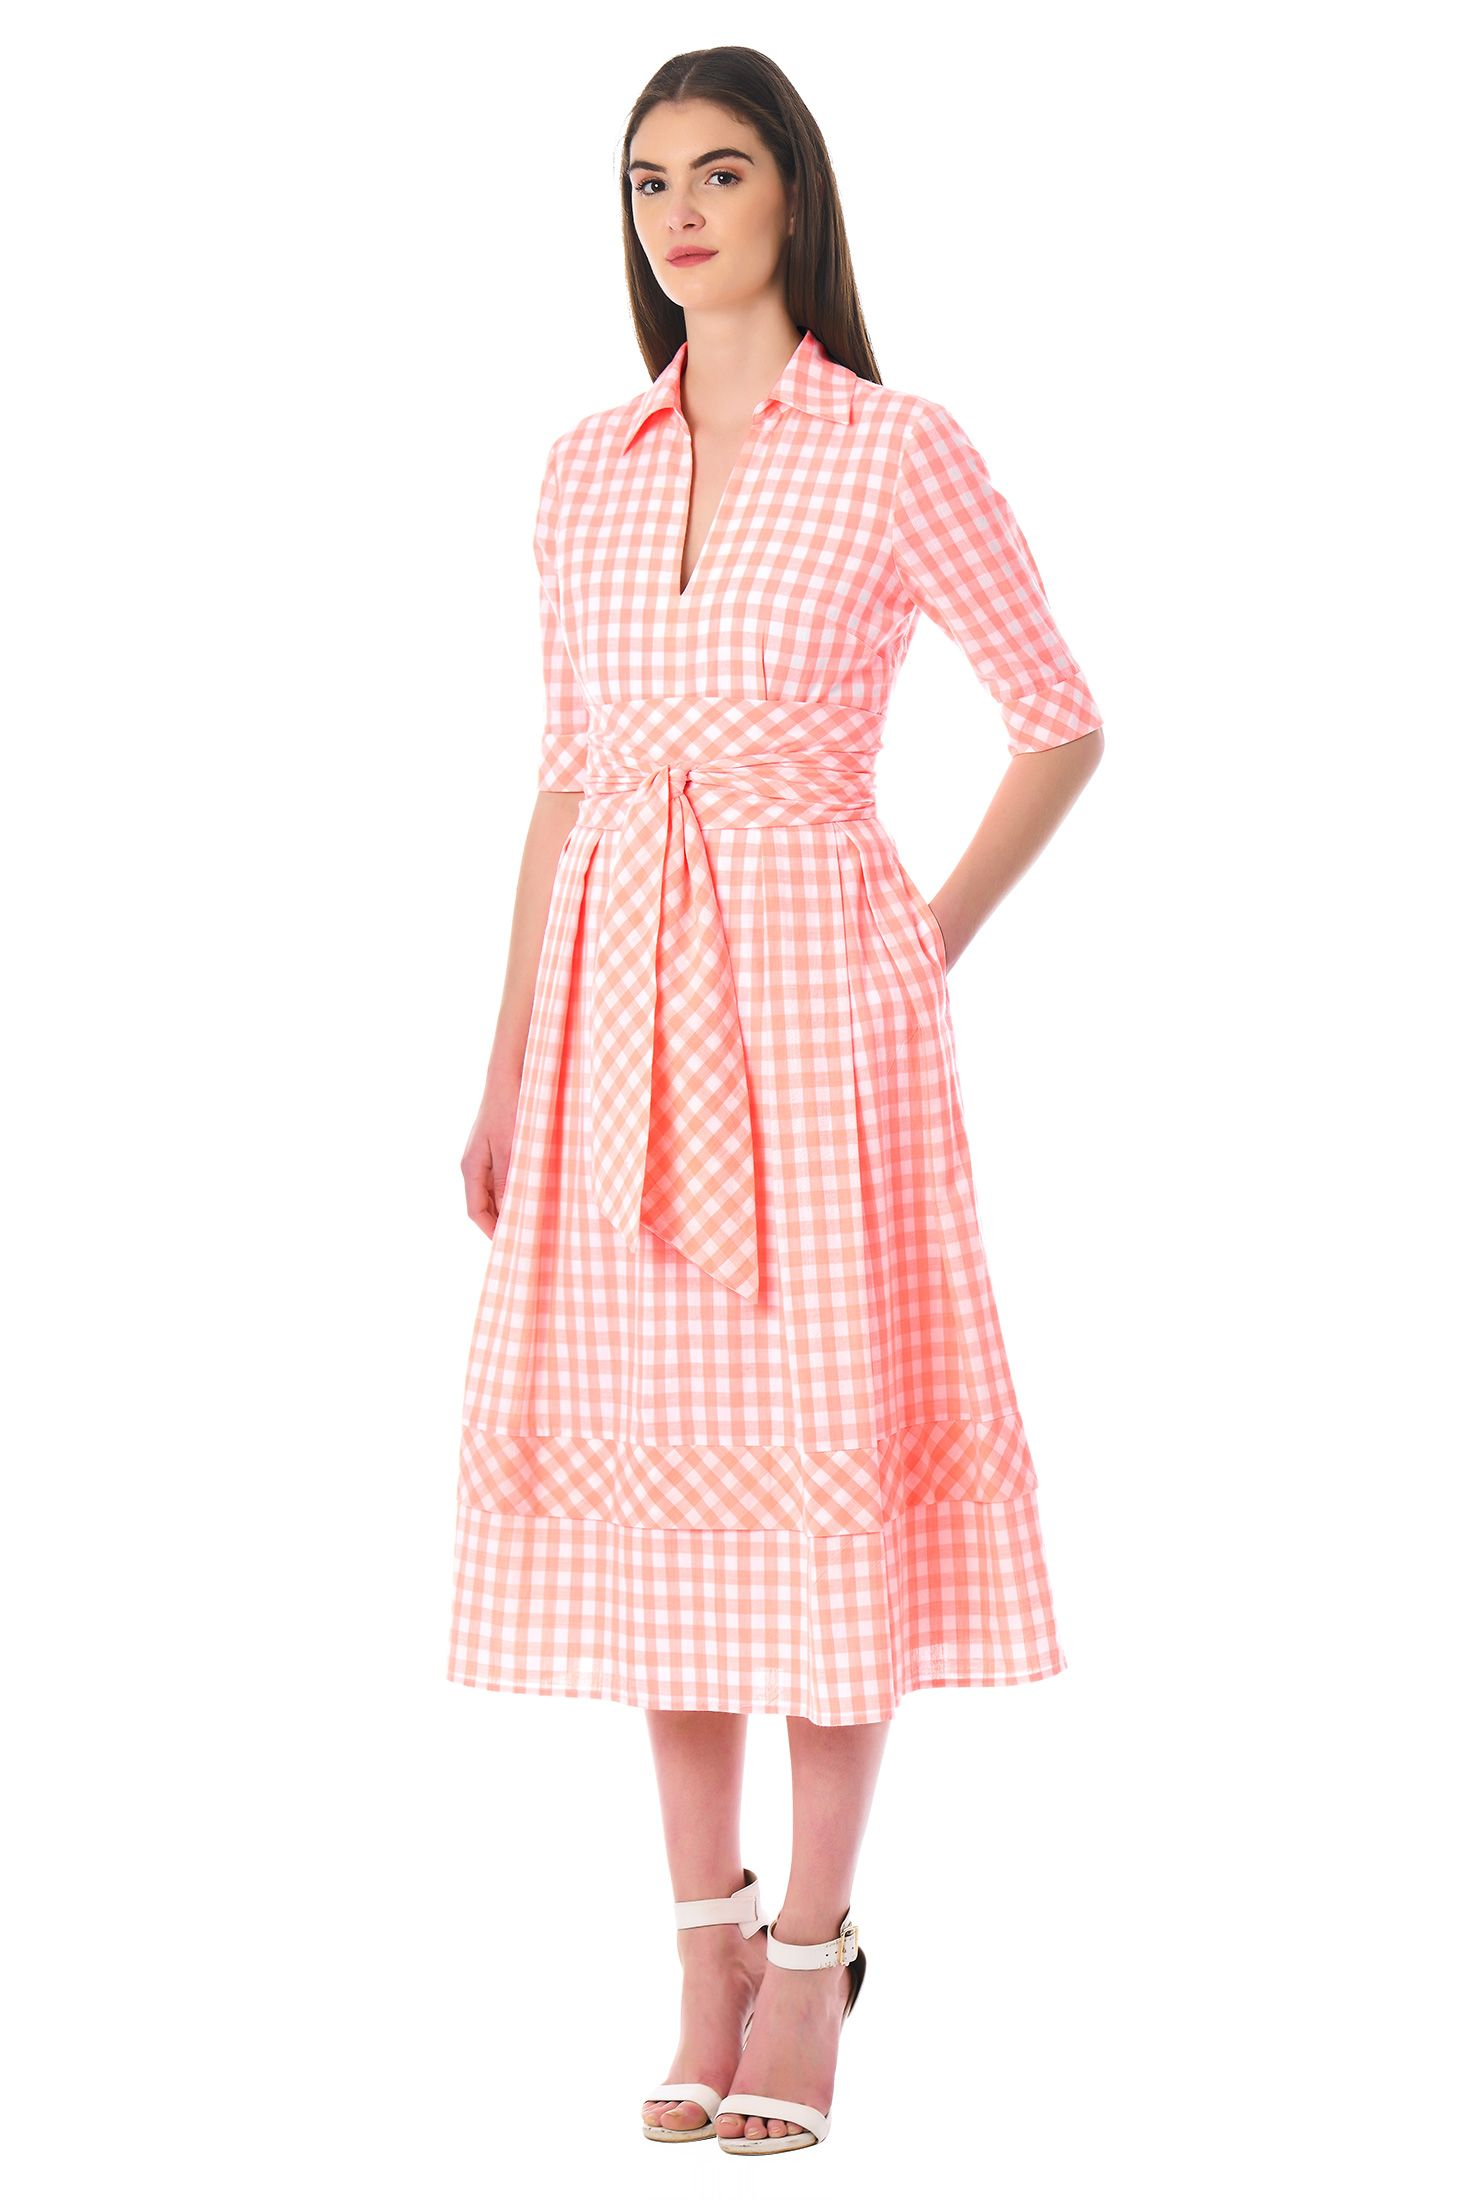 Obi belt gingham check cotton dress | Vestiditos, Ropa para mujeres ...